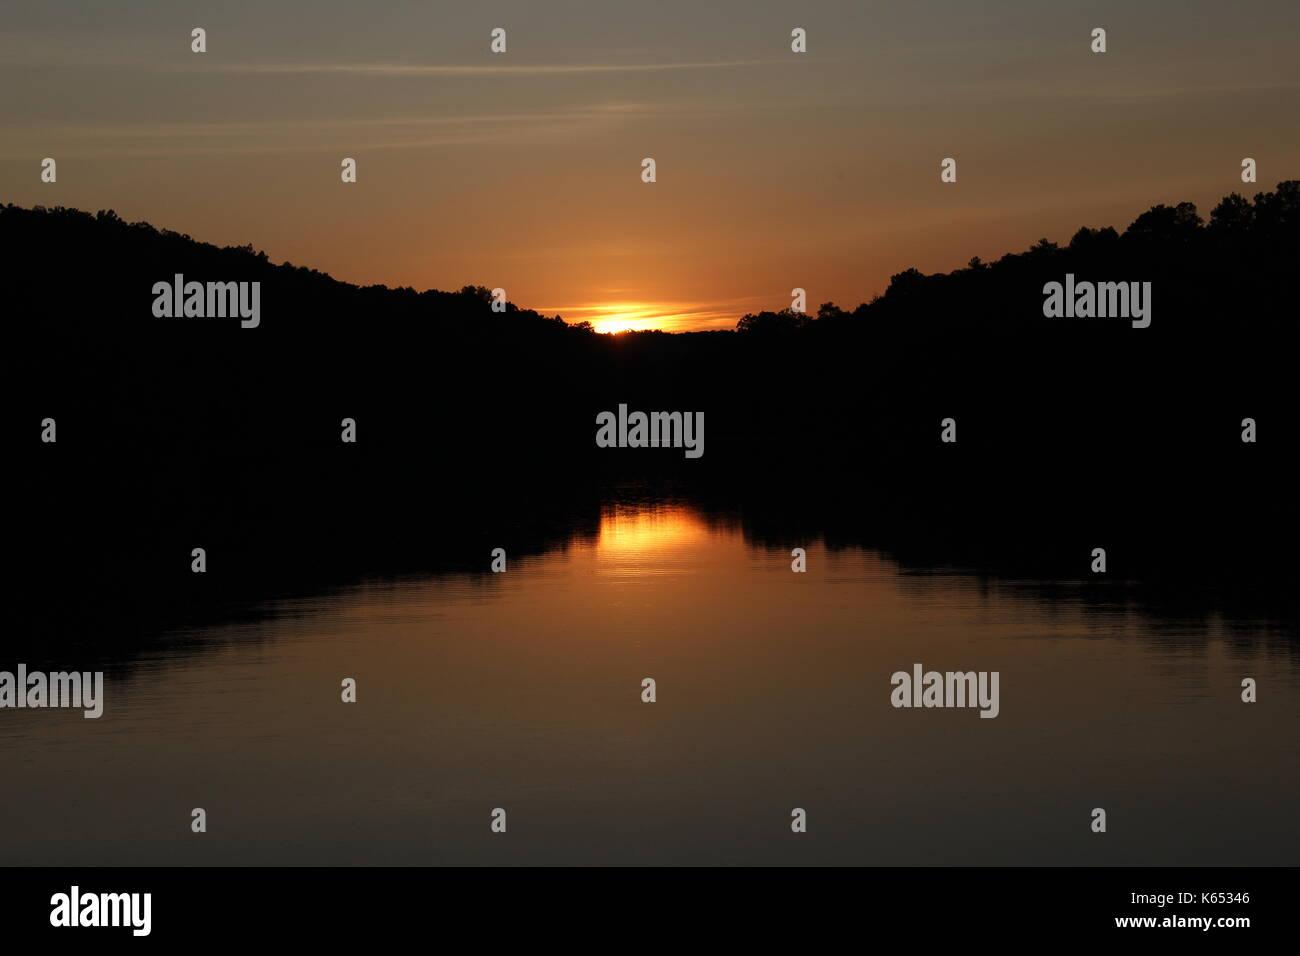 Symmetric sunset - Stock Image